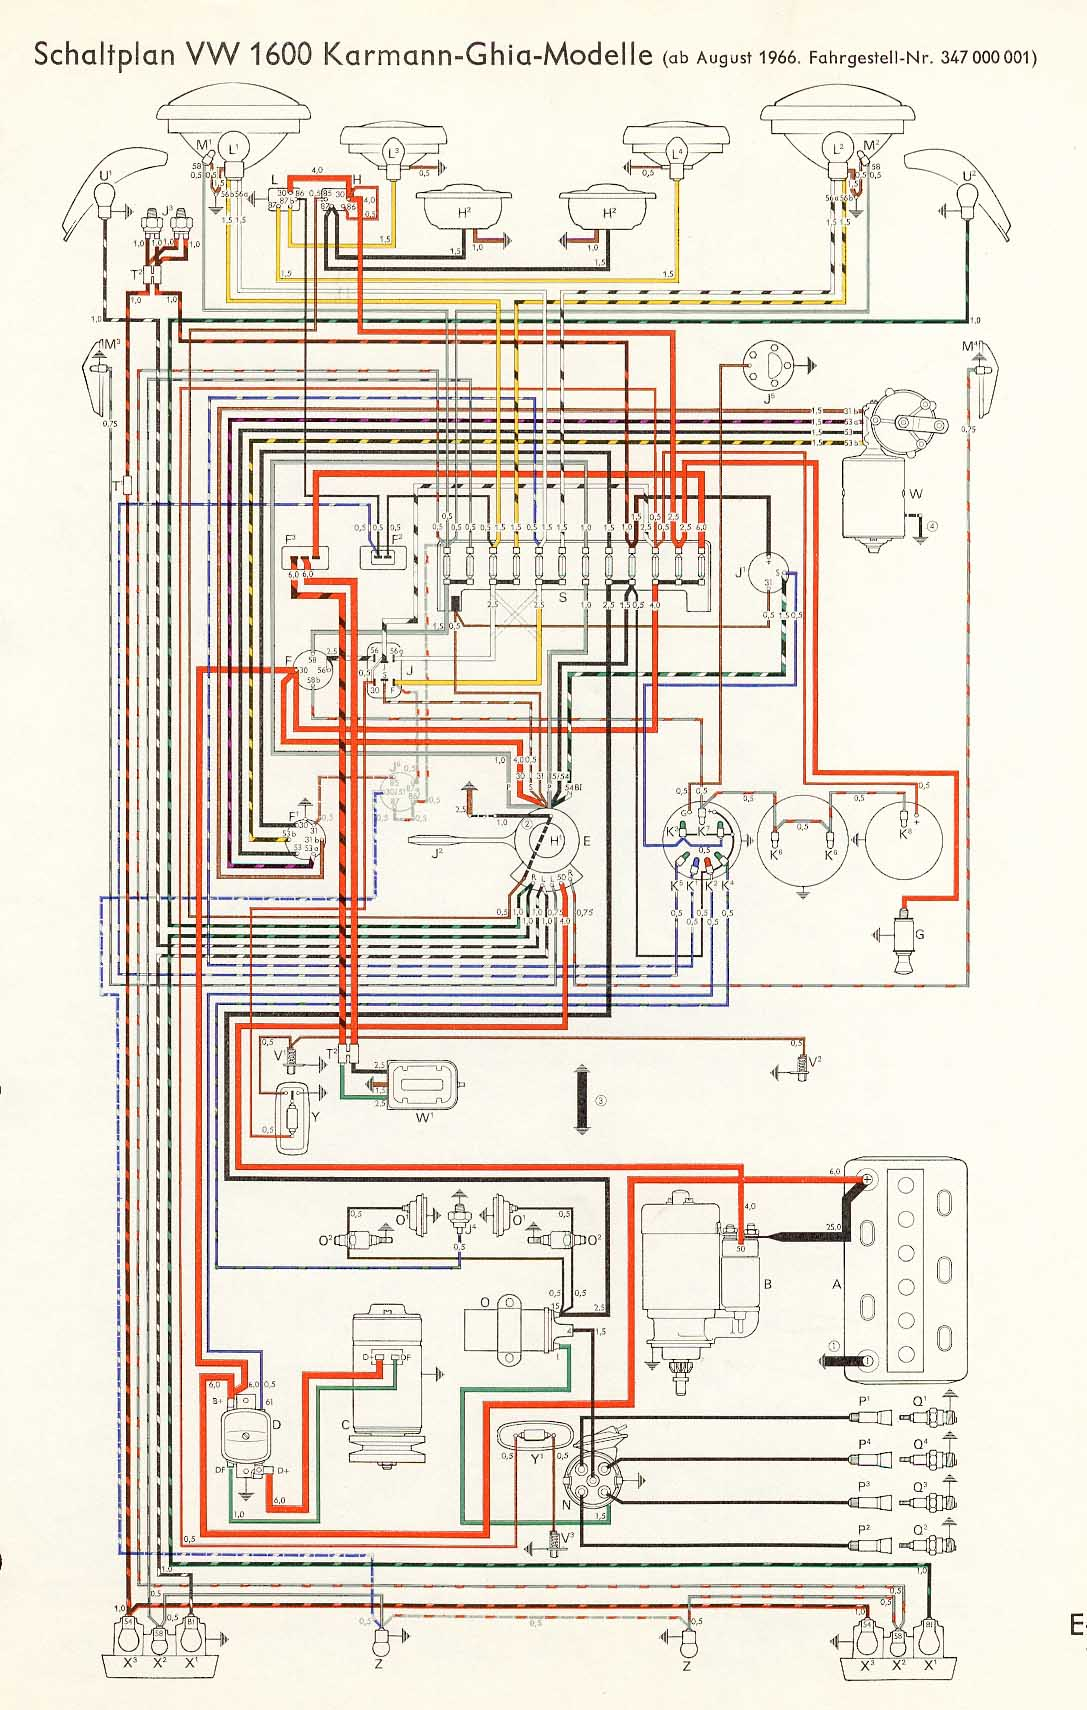 71 Karmann Ghia Wiring Diagram Pioneer Deh 3400 Wiring Diagram Bege Wiring Diagram